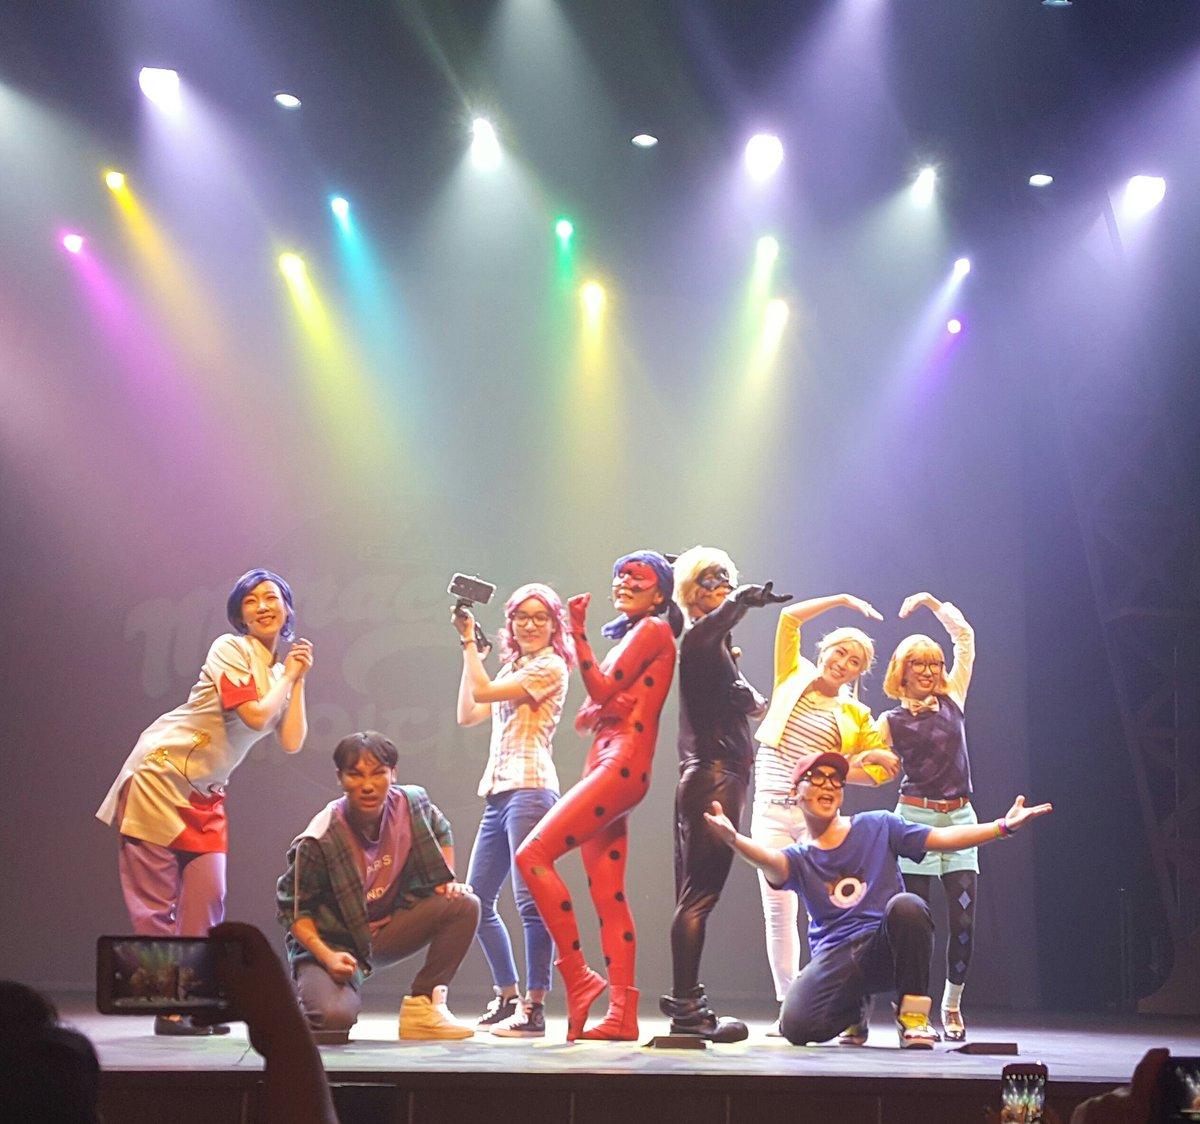 Ladybug (musical) | Miraculous Ladybug Wiki | FANDOM powered by Wikia